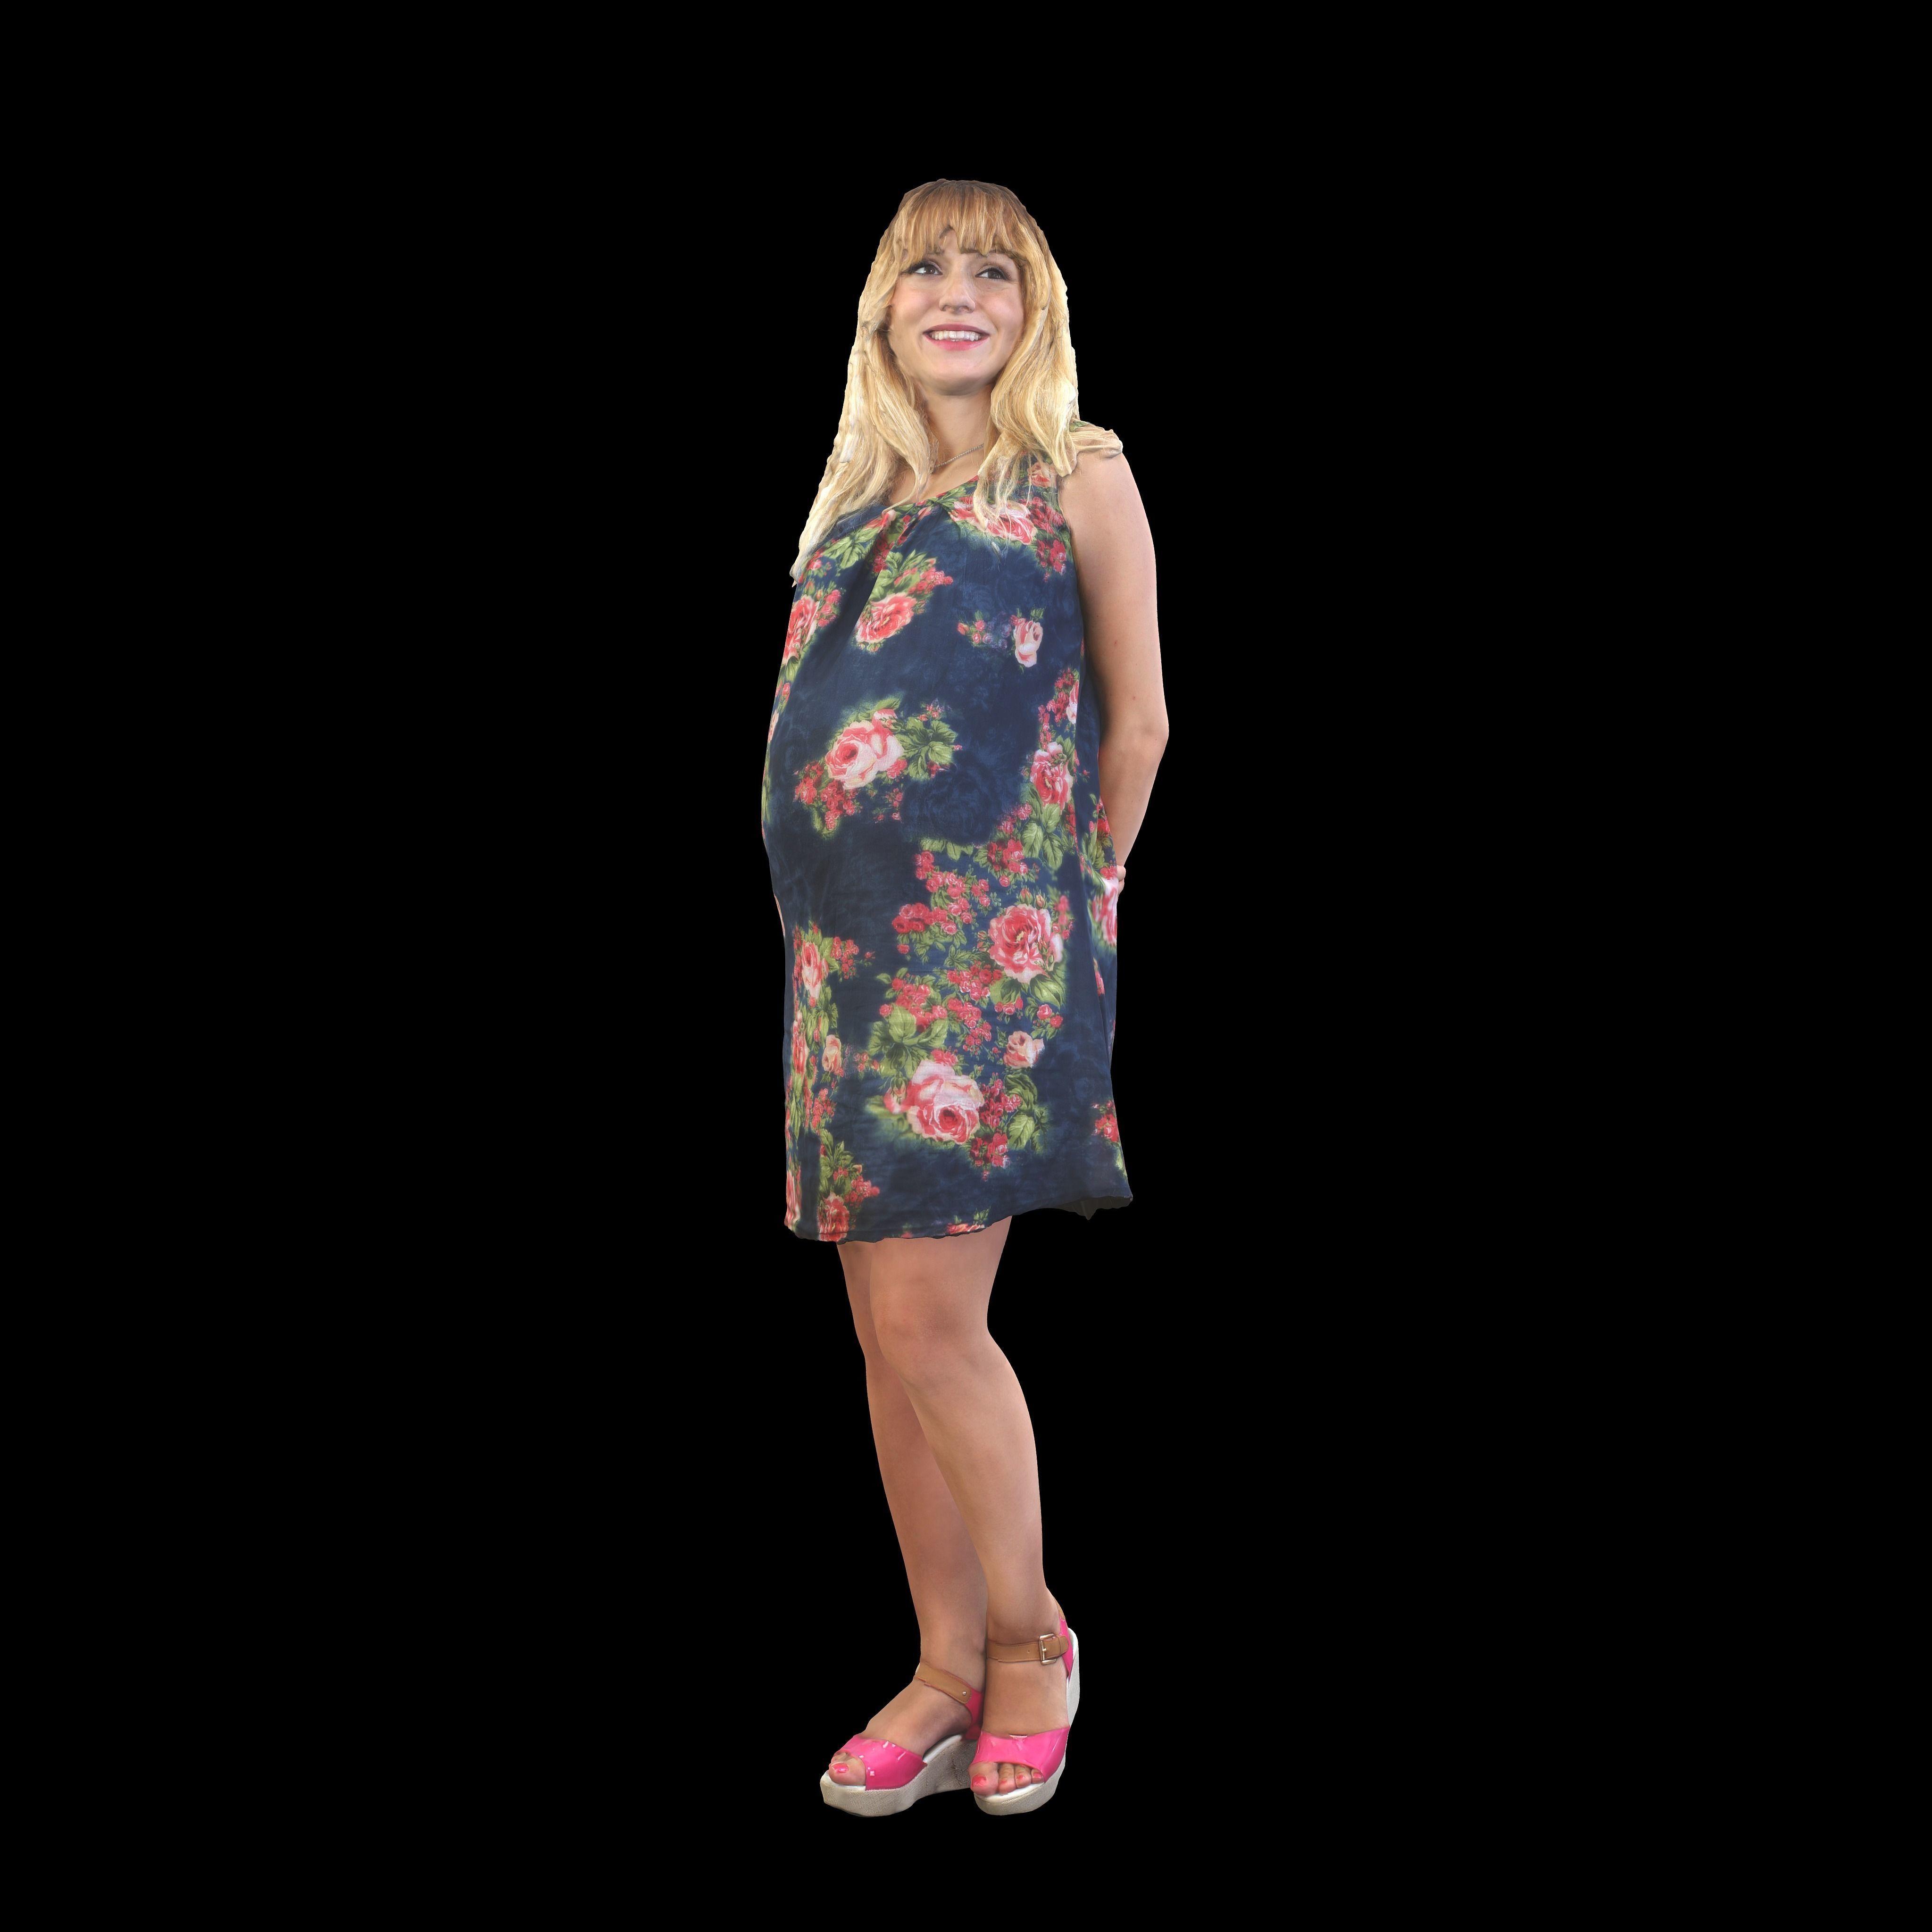 No333 - Pregnant Lady